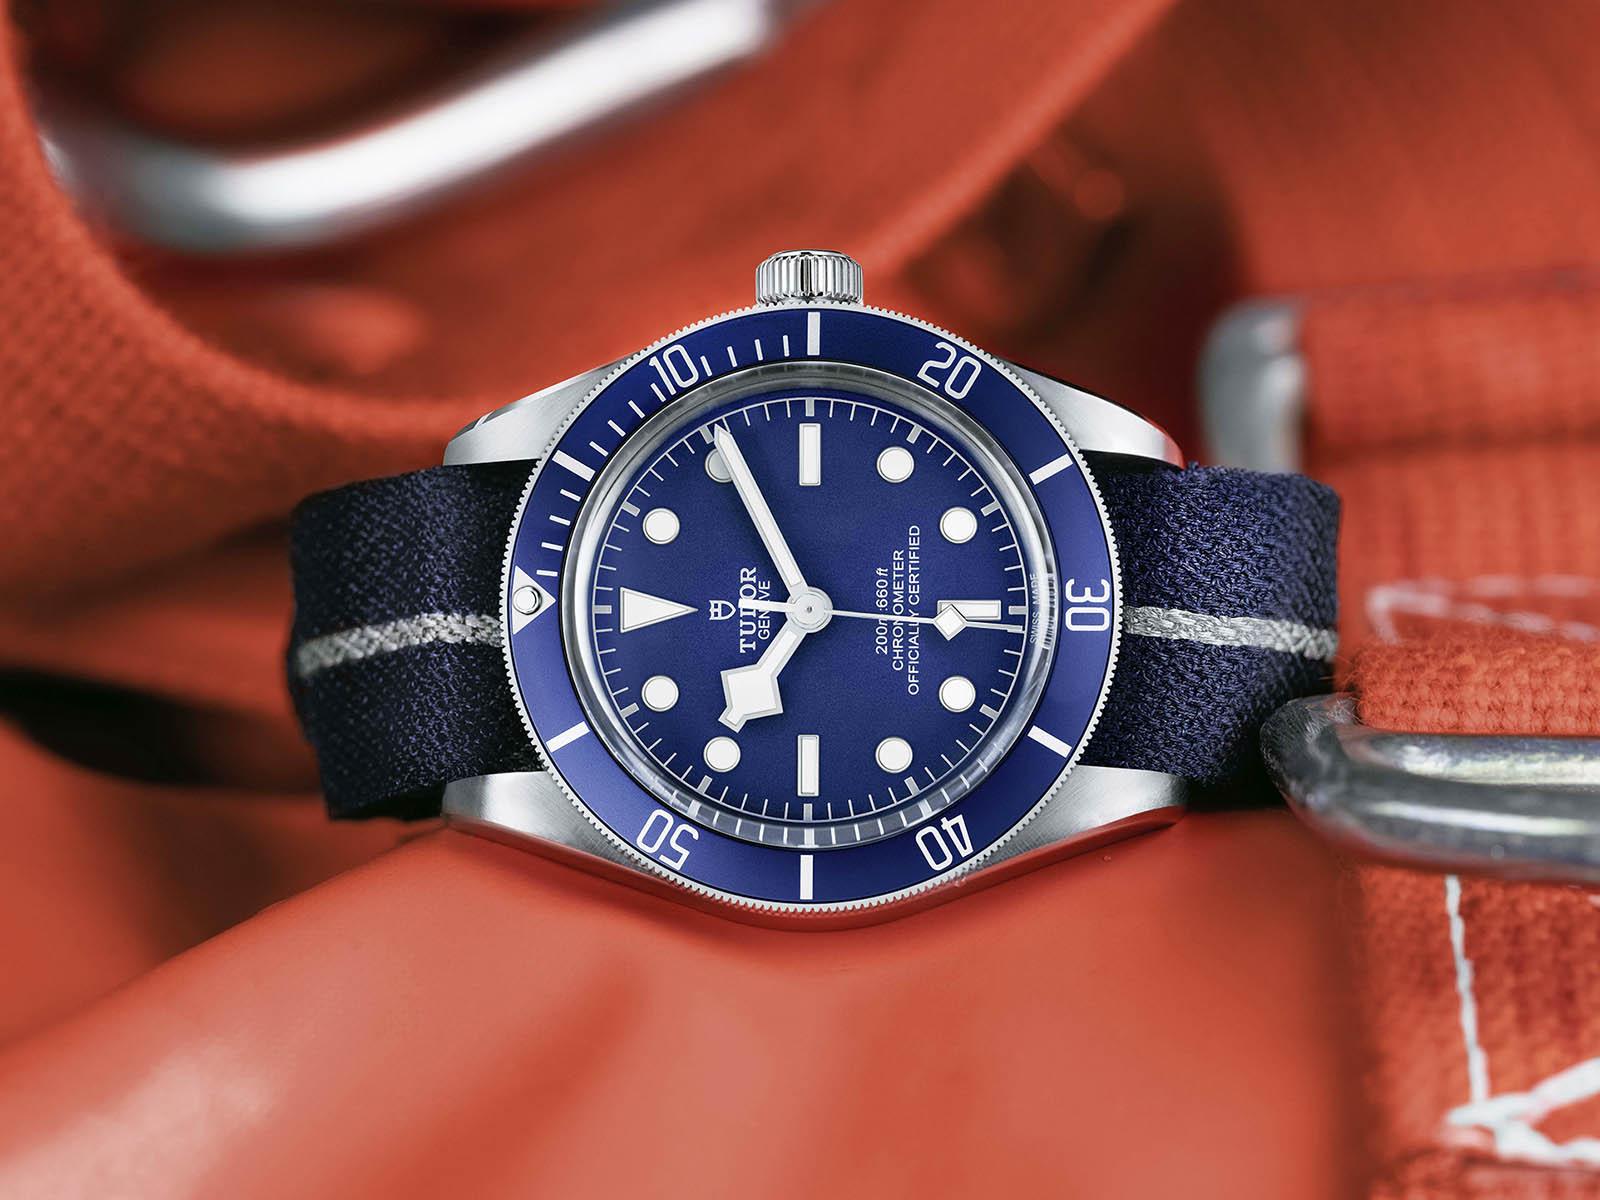 79030b-tudor-black-bay-fifty-eight-navy-blue-3.jpg